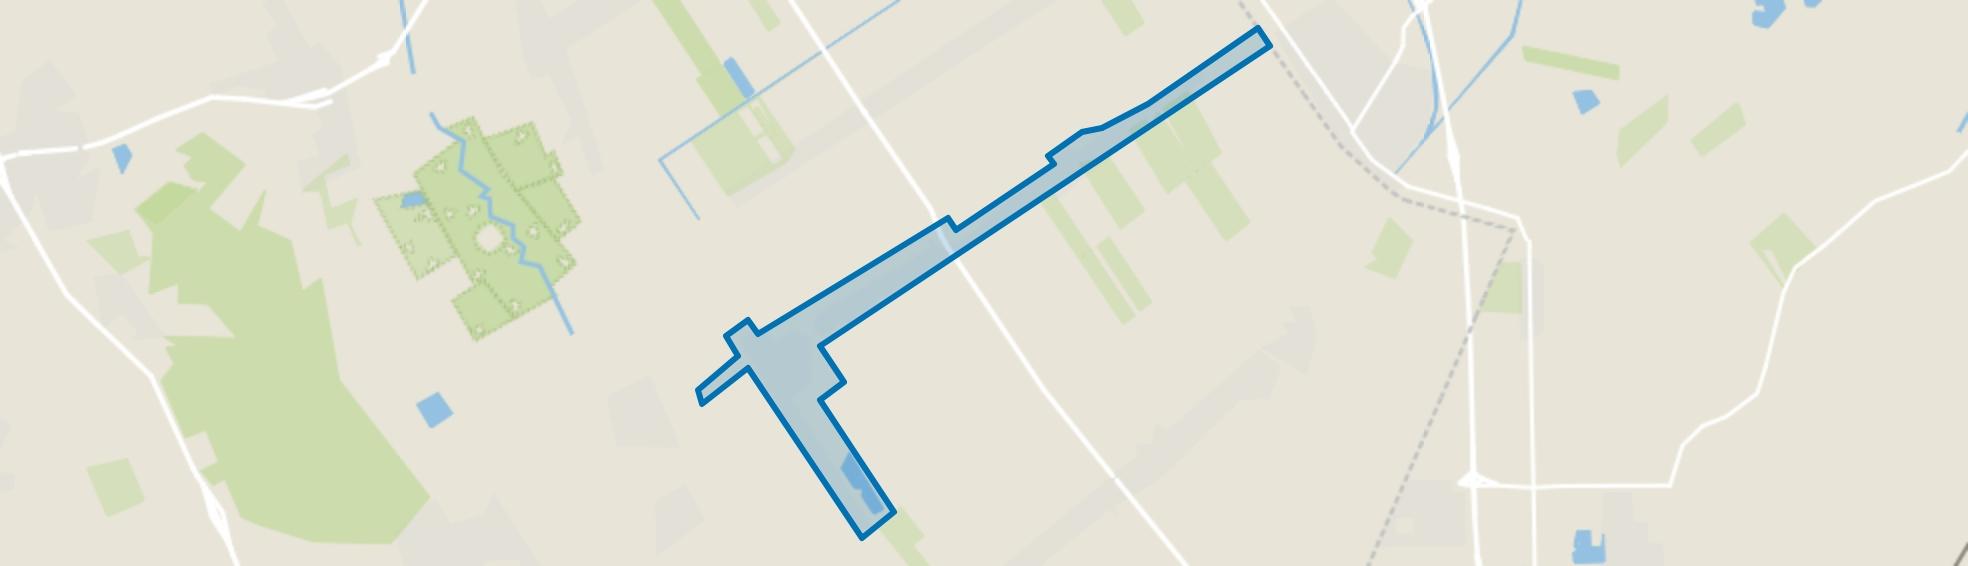 Tweede Exloërmond, 2e Exloërmond map